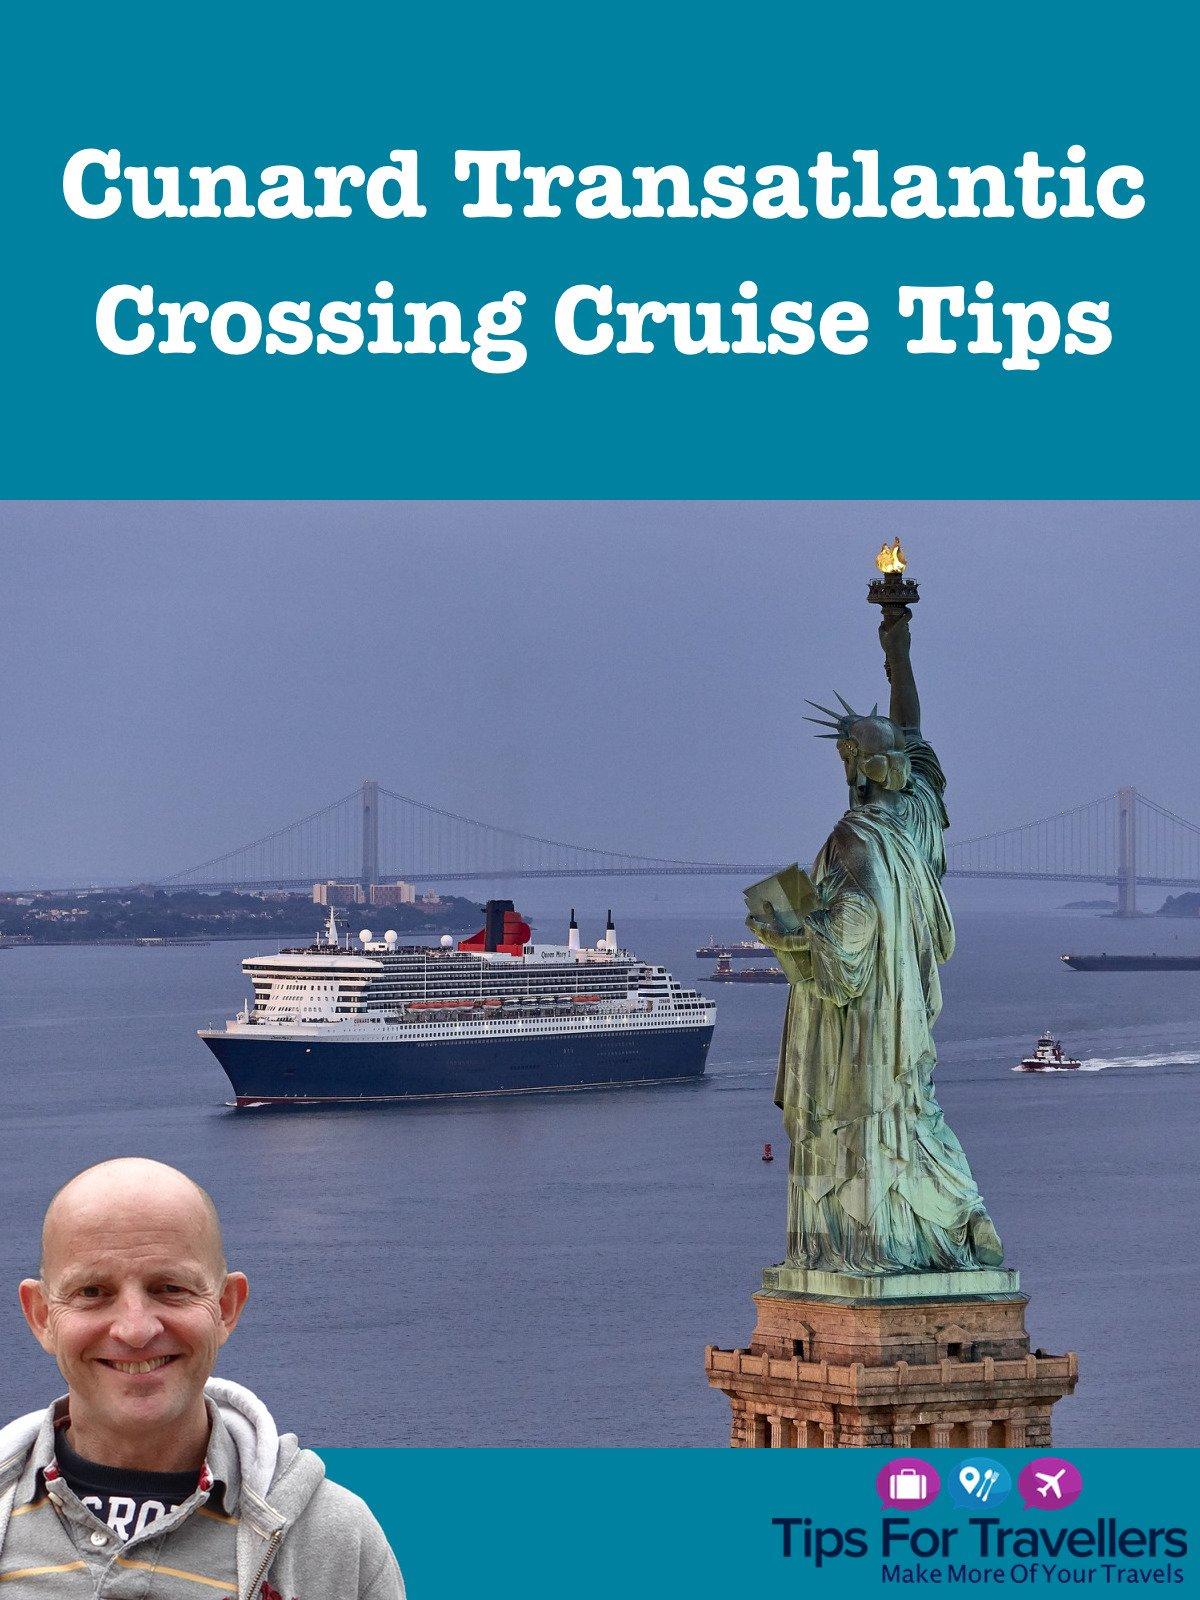 Clip: Cunard Transatlantic Crossing Cruise Tips